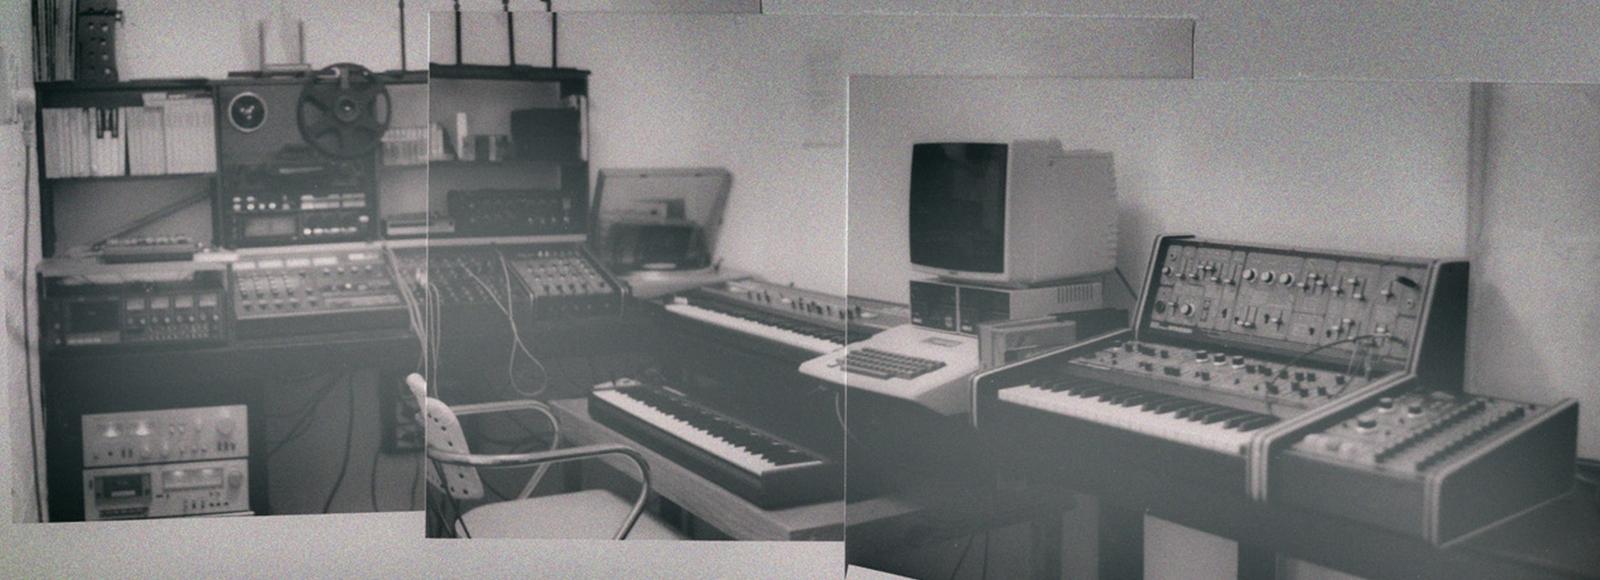 Media-Space sound studio (1983)